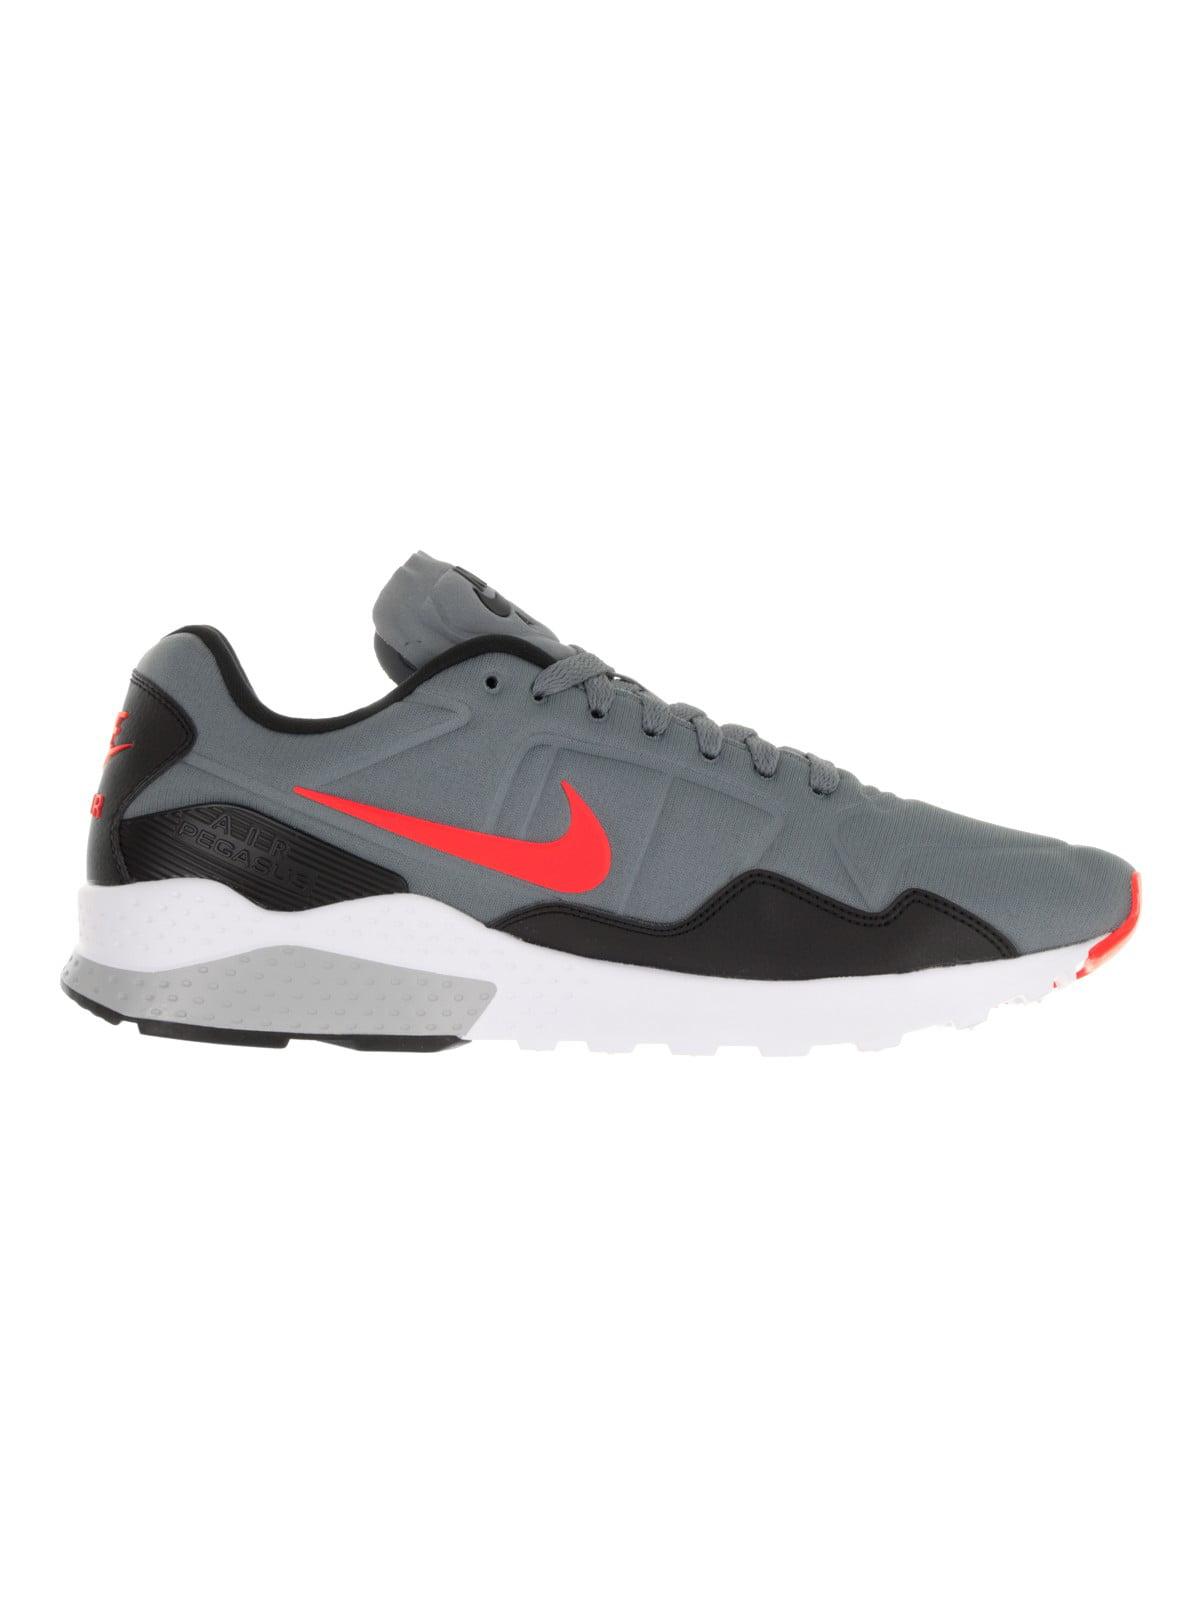 Gentleman/Lady: 92 Nike Men's Air Zoom Pegasus 92 Gentleman/Lady: Running Shoe:  Up-to-date-styling be98ce